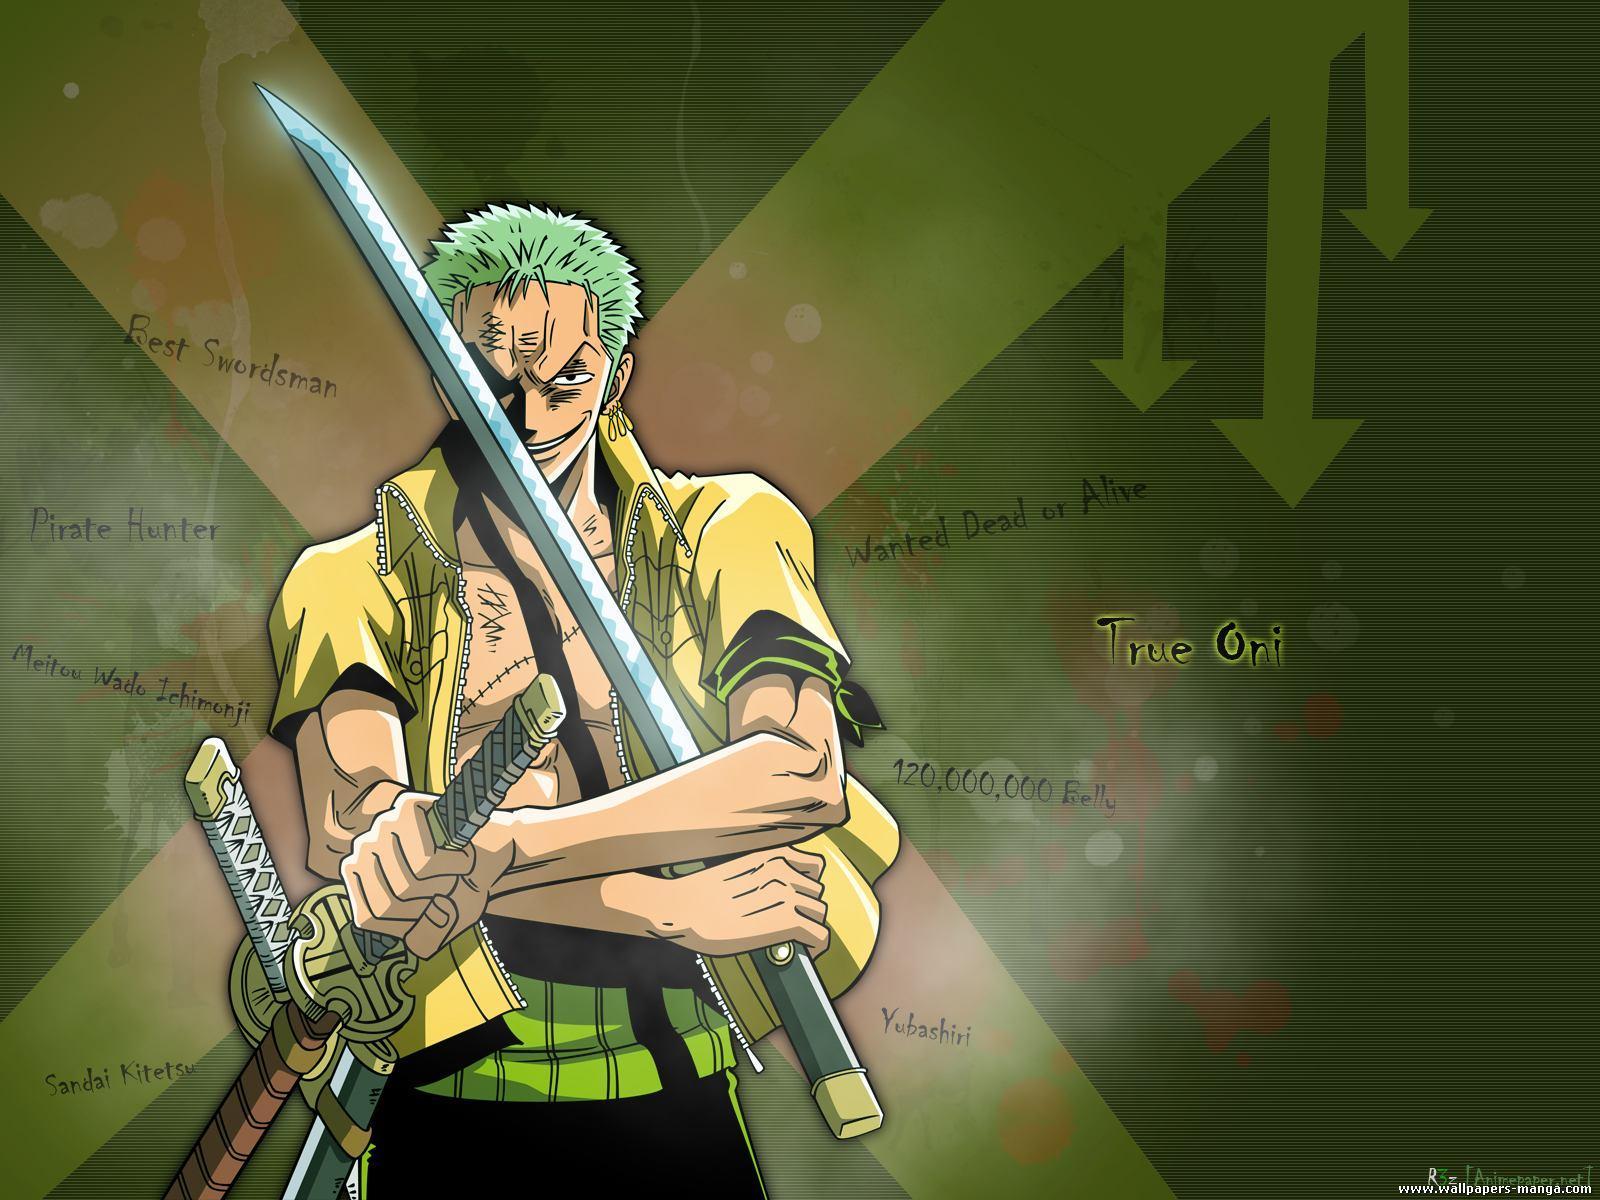 Trololo Blogg Wallpaper Hd One Piece New World